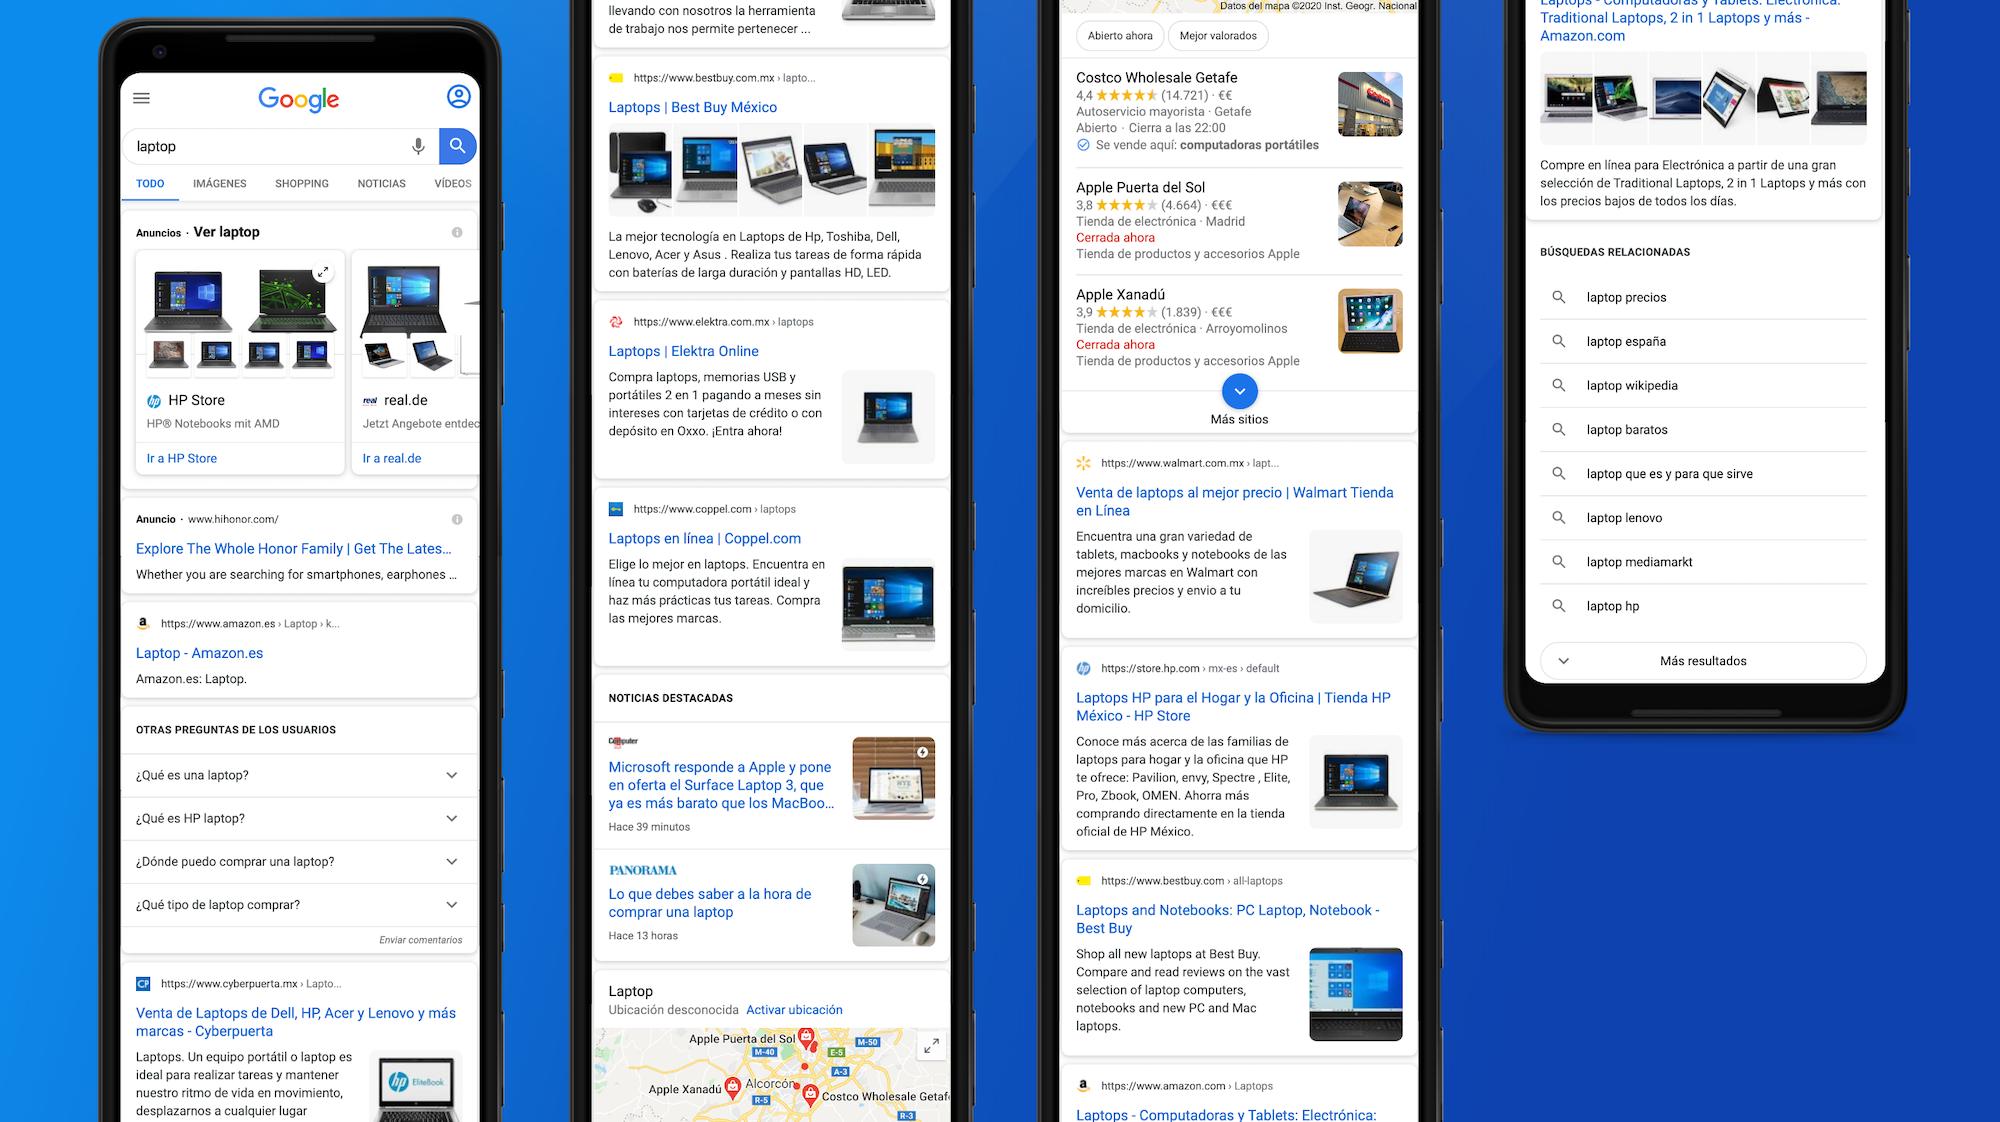 numerosas integraciones de Google